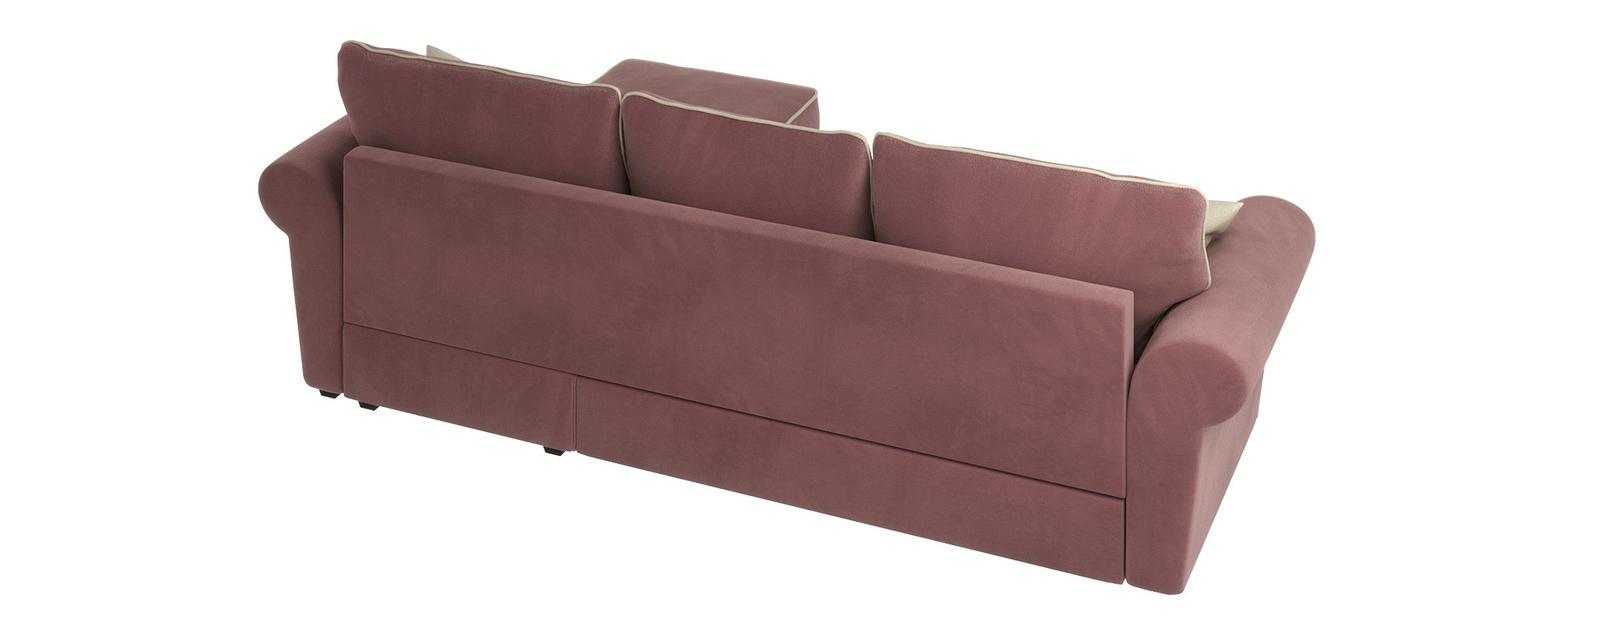 Диван тканевый угловой Милфорд Grace розово-серый (Велюр)